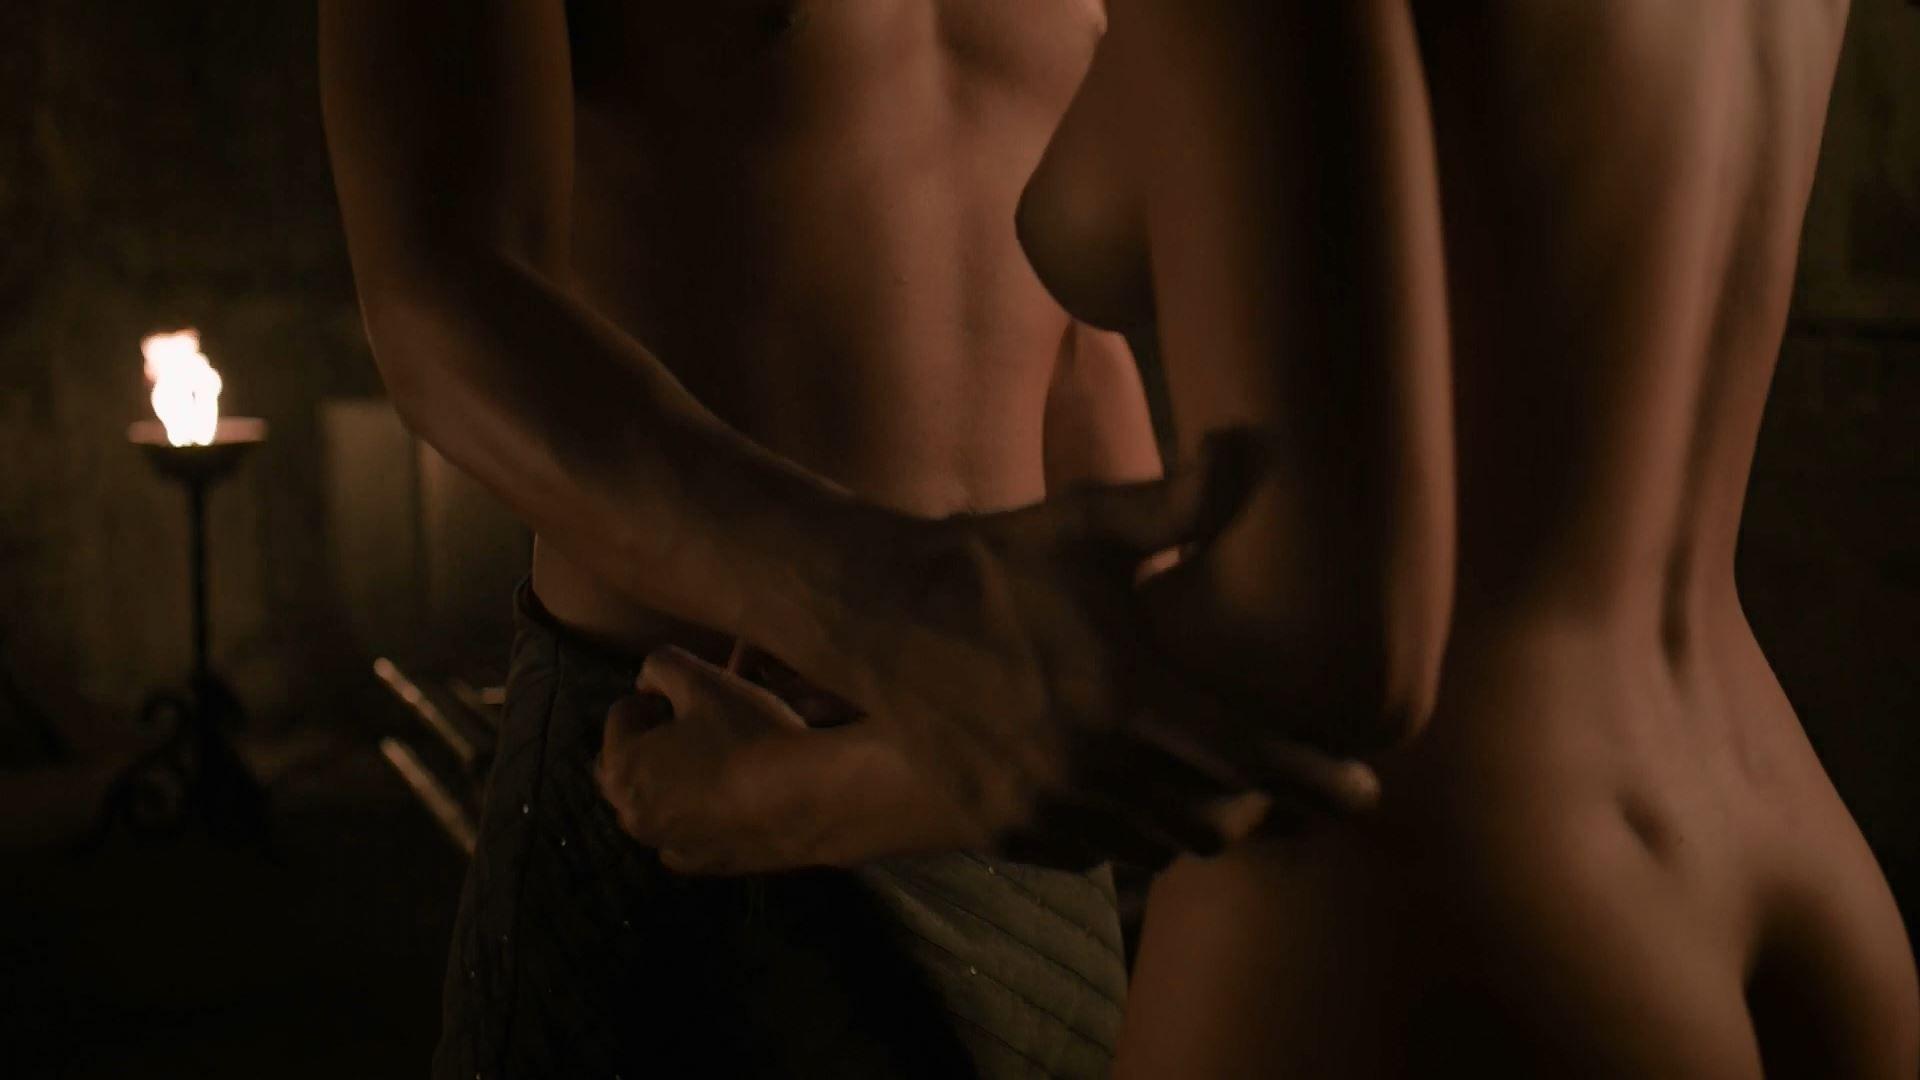 Game Of Thrones Season 4 Nude Scenes